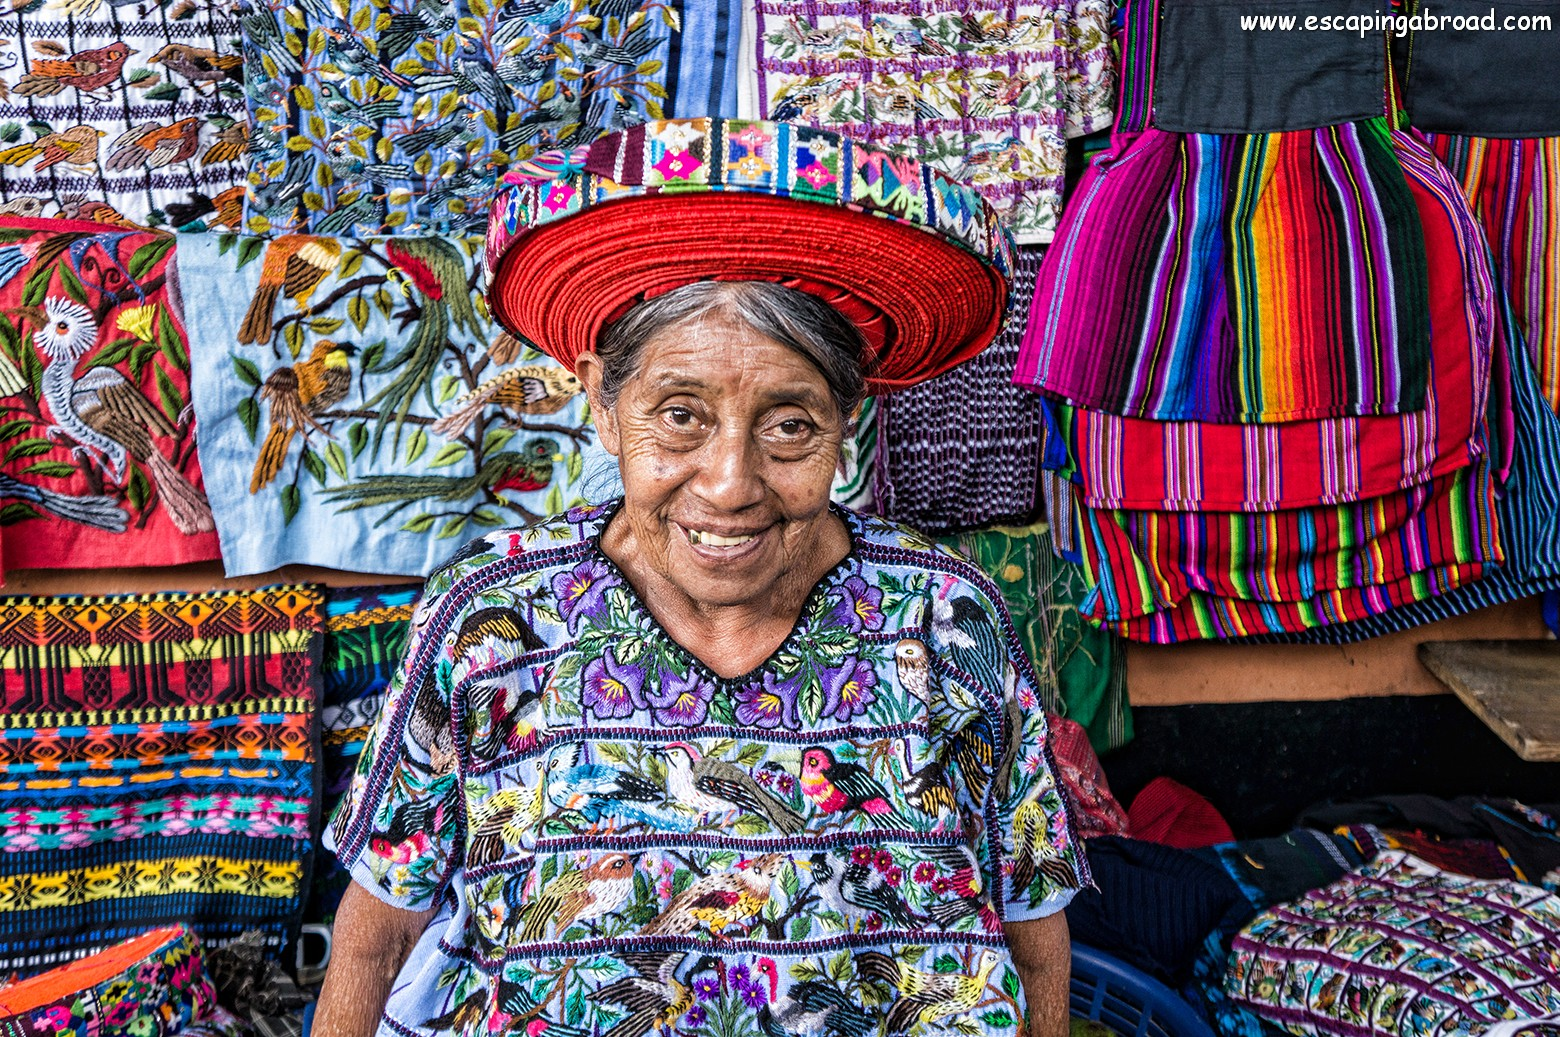 Guatemala www.escapingabroad.com